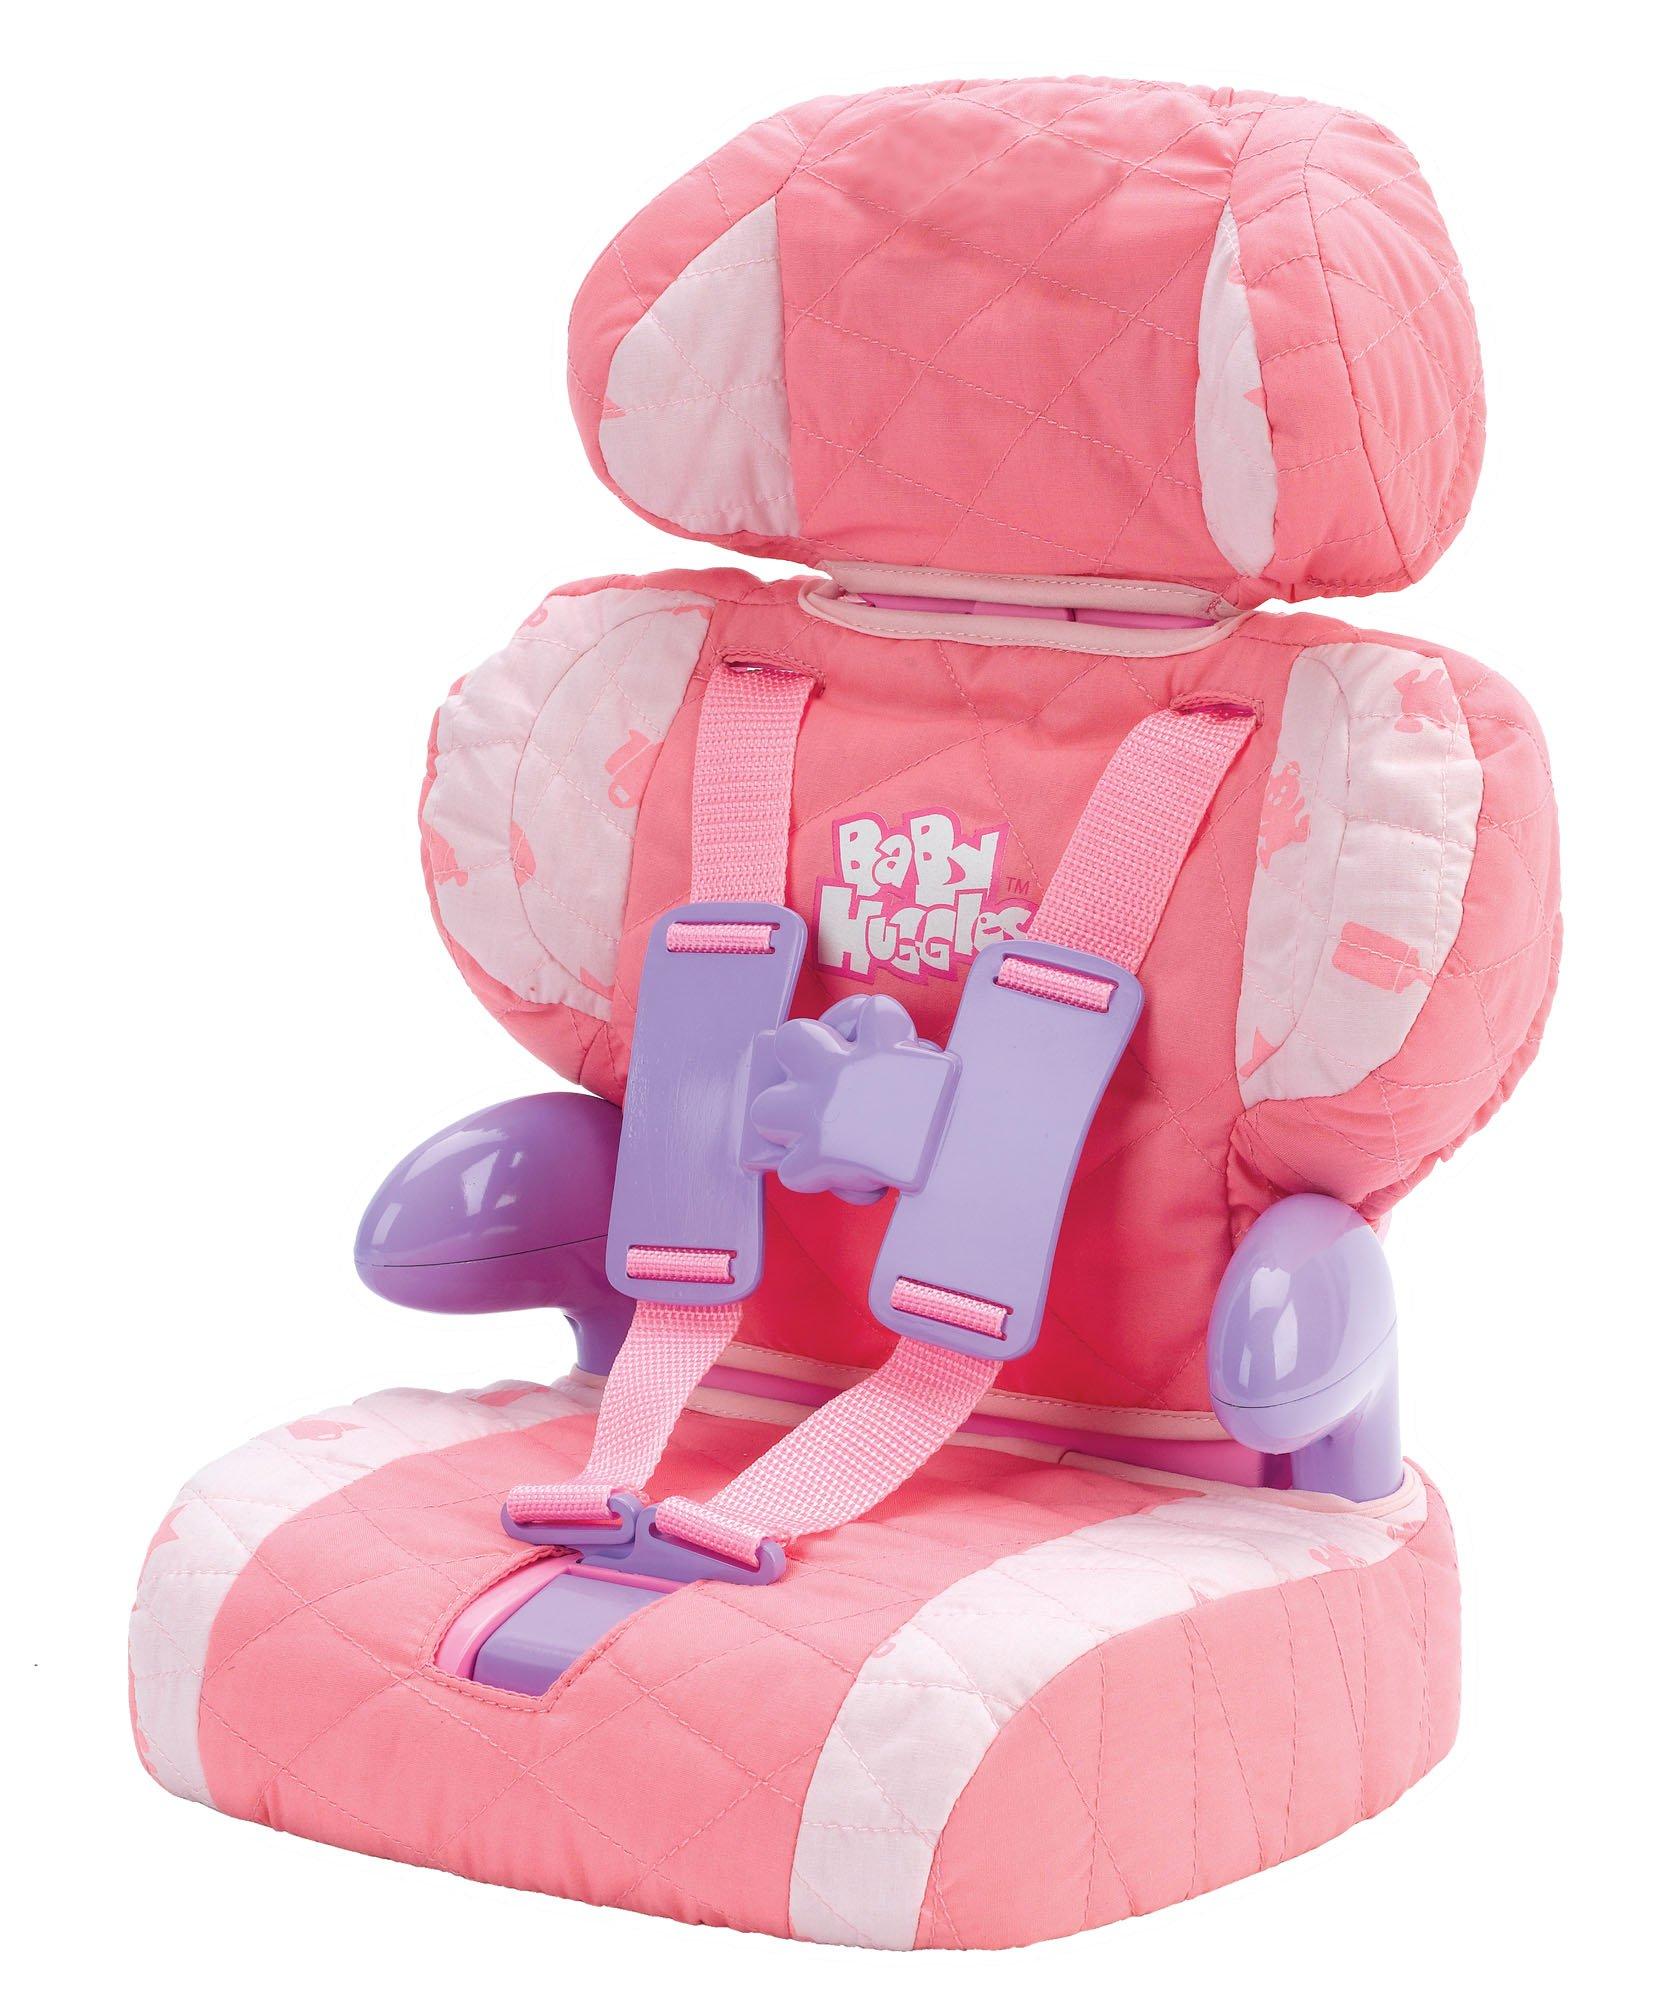 Casdon 710 Baby Huggles Dolls Car Boosterseat NEW   eBay